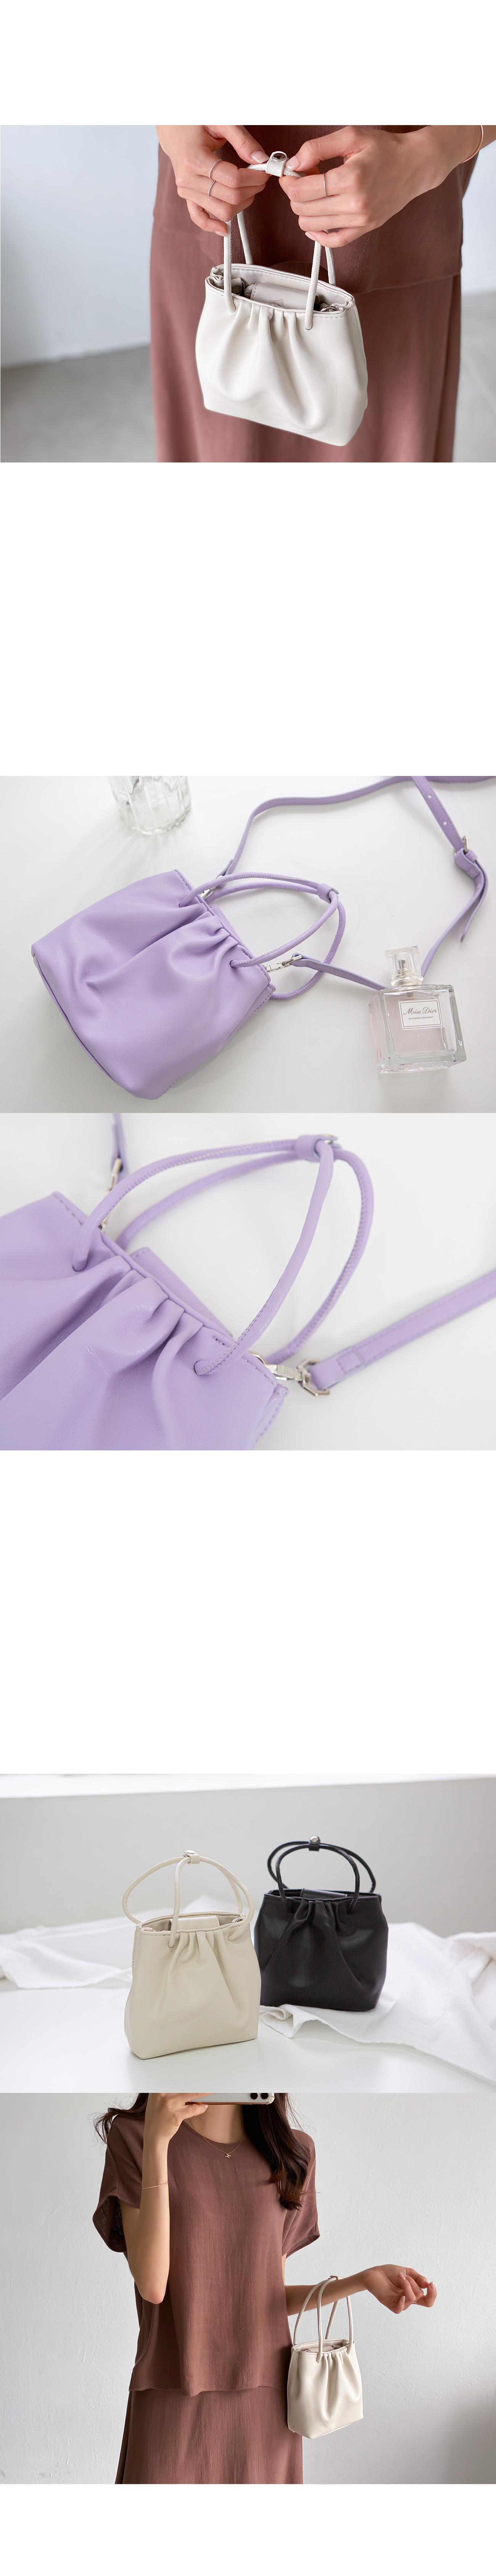 Daily Square Pocket Tote Bag #86227